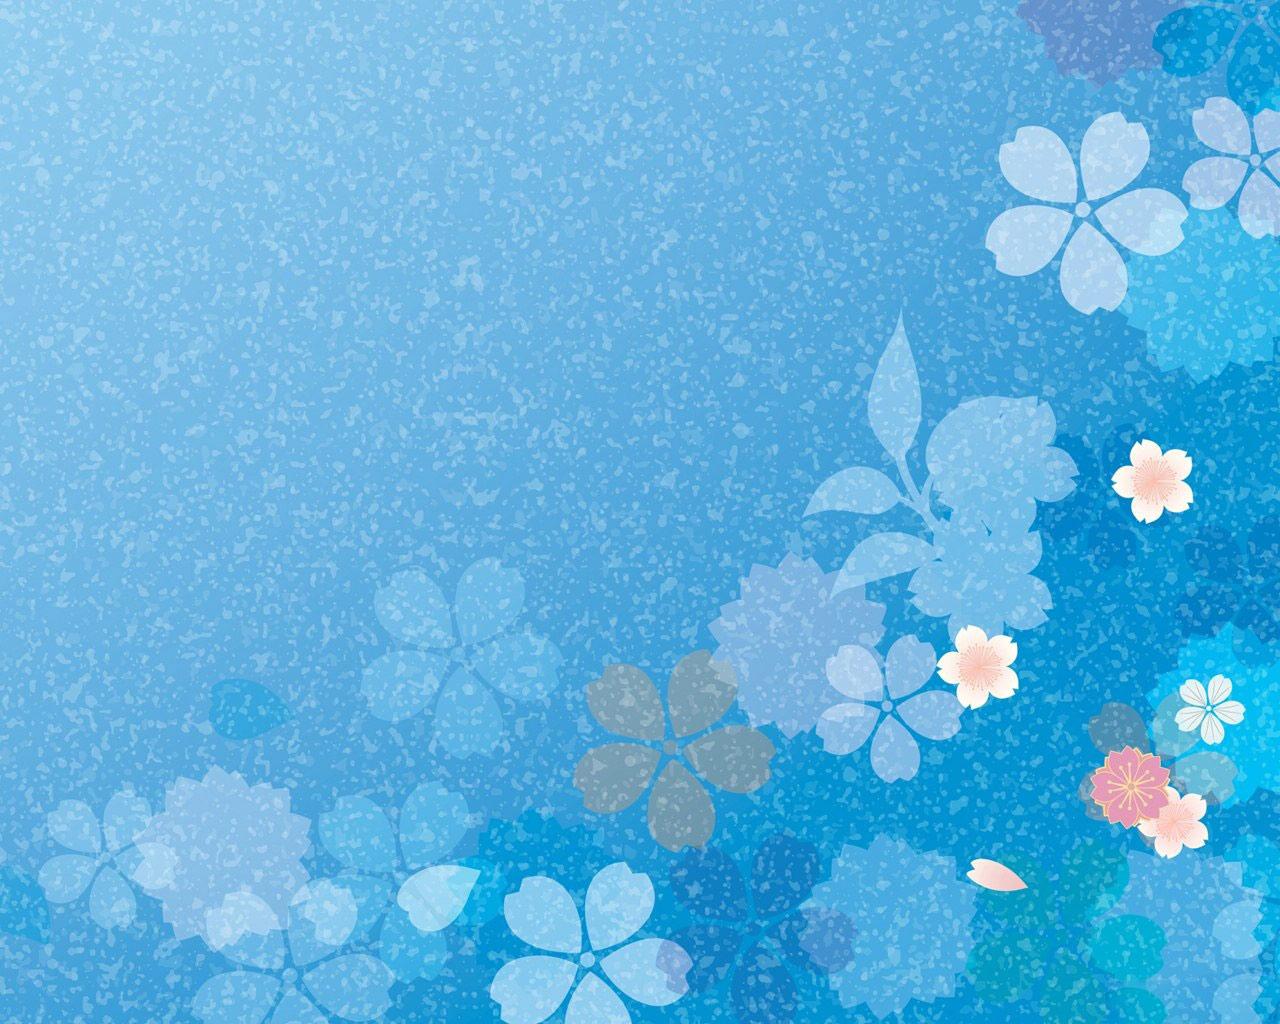 Blue Flower Background Microsoft Windows 7 Theme 1280x1024